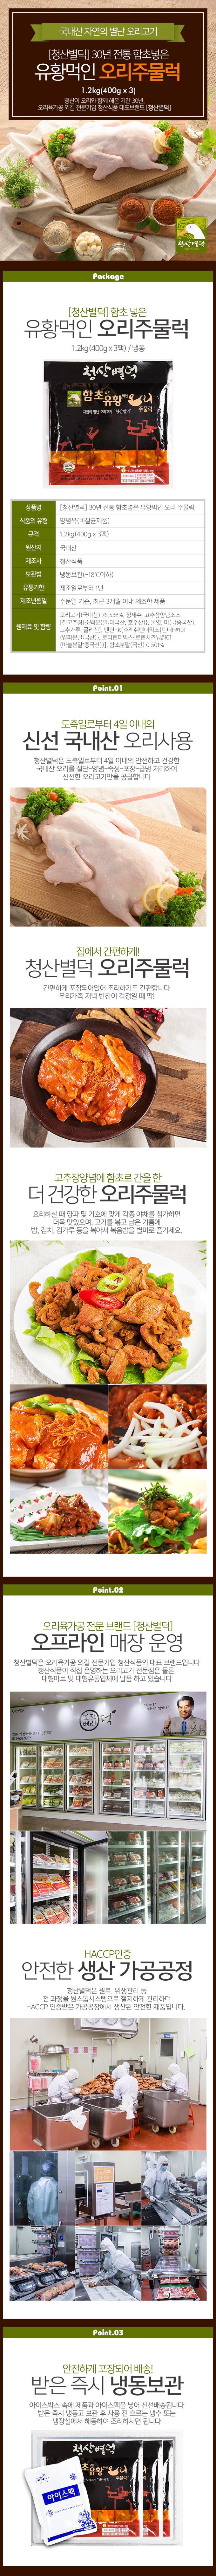 choungsan-duck_jumulreok_400gx3.jpg